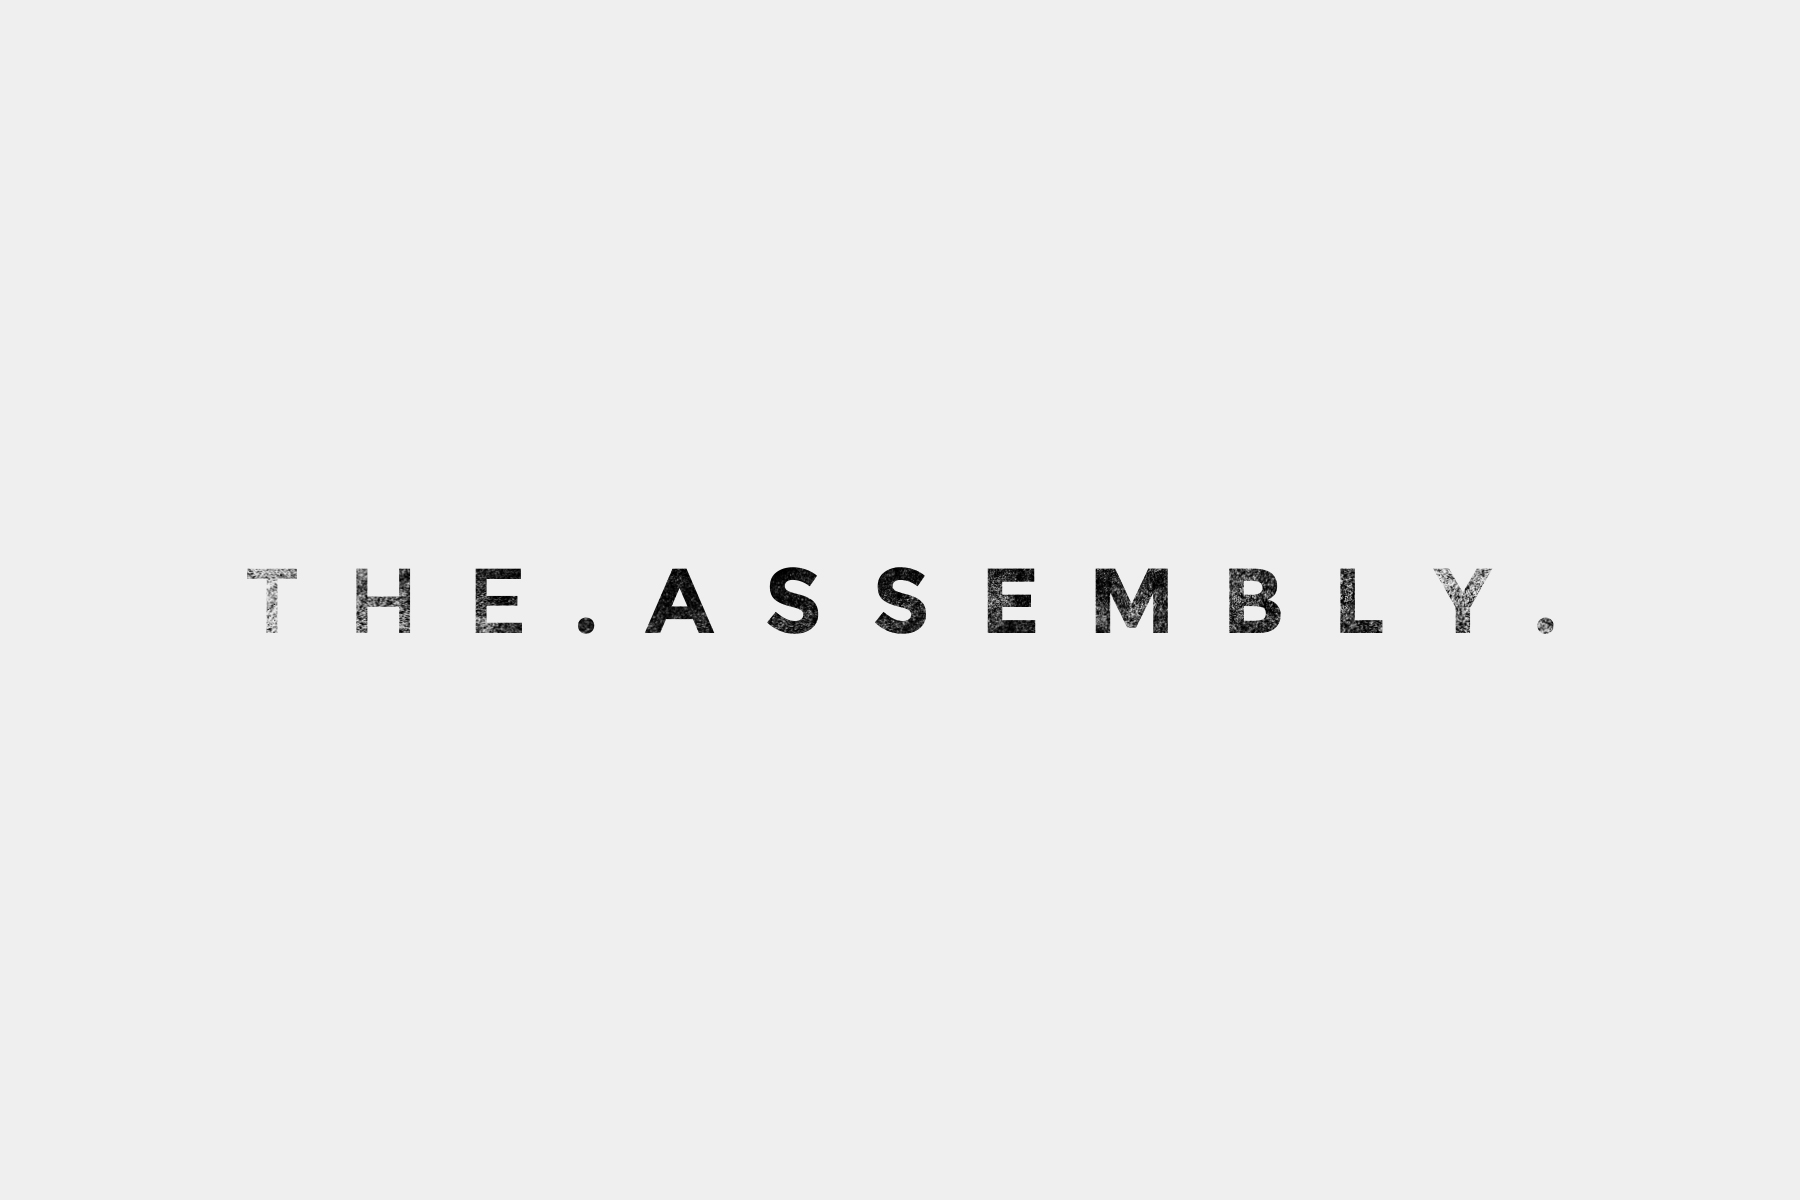 TheAssembly_brand2-1800x1200.jpg